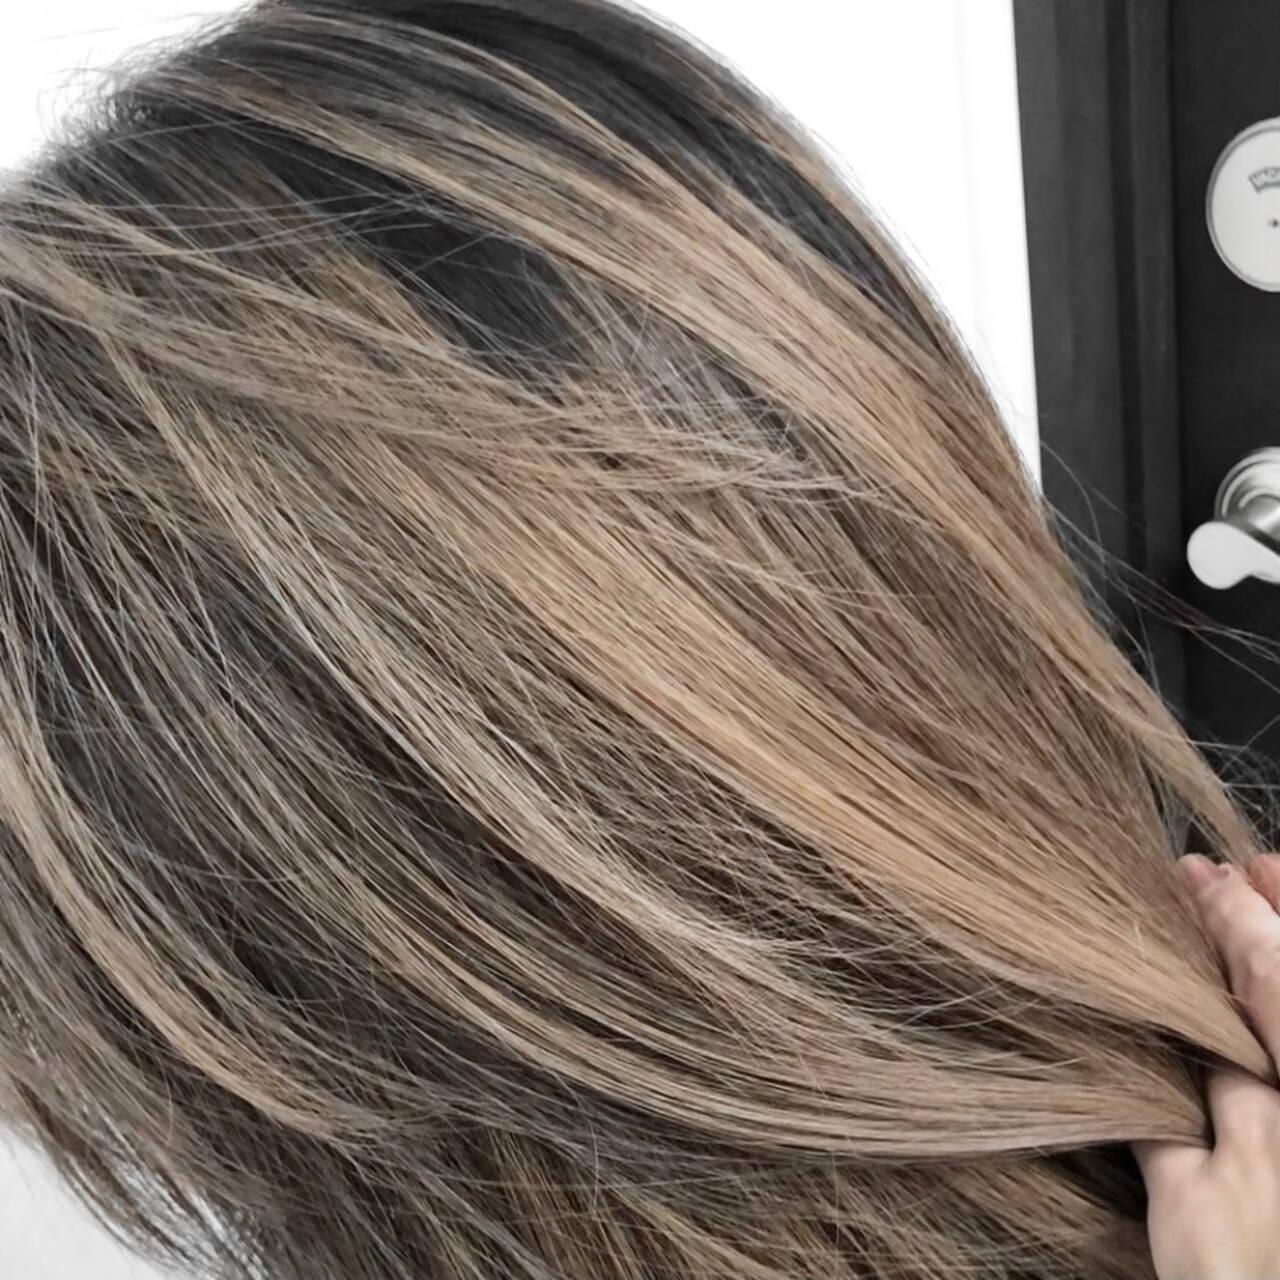 3Dハイライト 外国人風カラー ベージュ ロングヘアスタイルや髪型の写真・画像